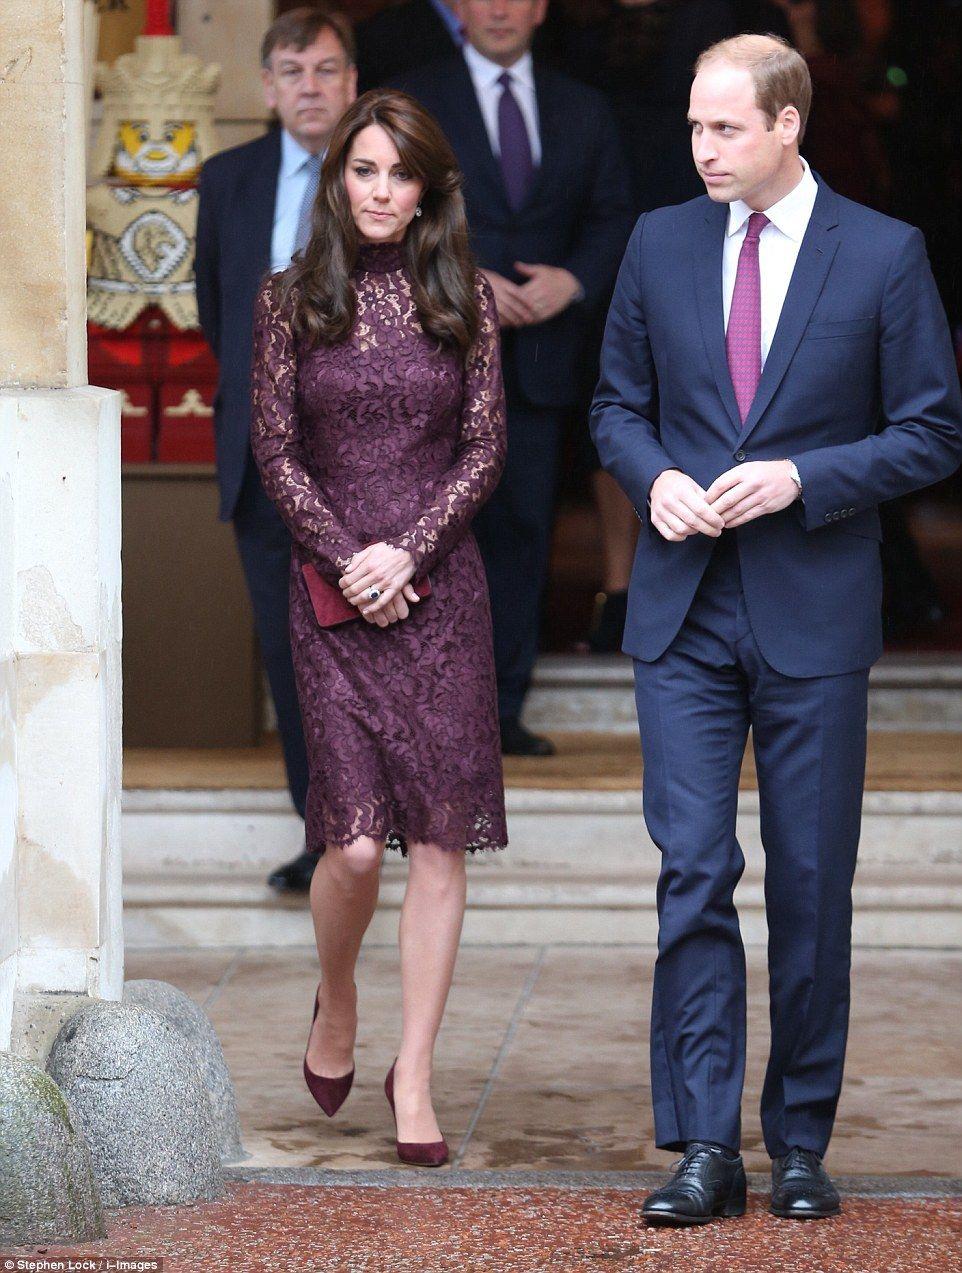 Lace dress kate middleton  Kate Middleton and Prince William  Kate  Pinterest  Plum lace